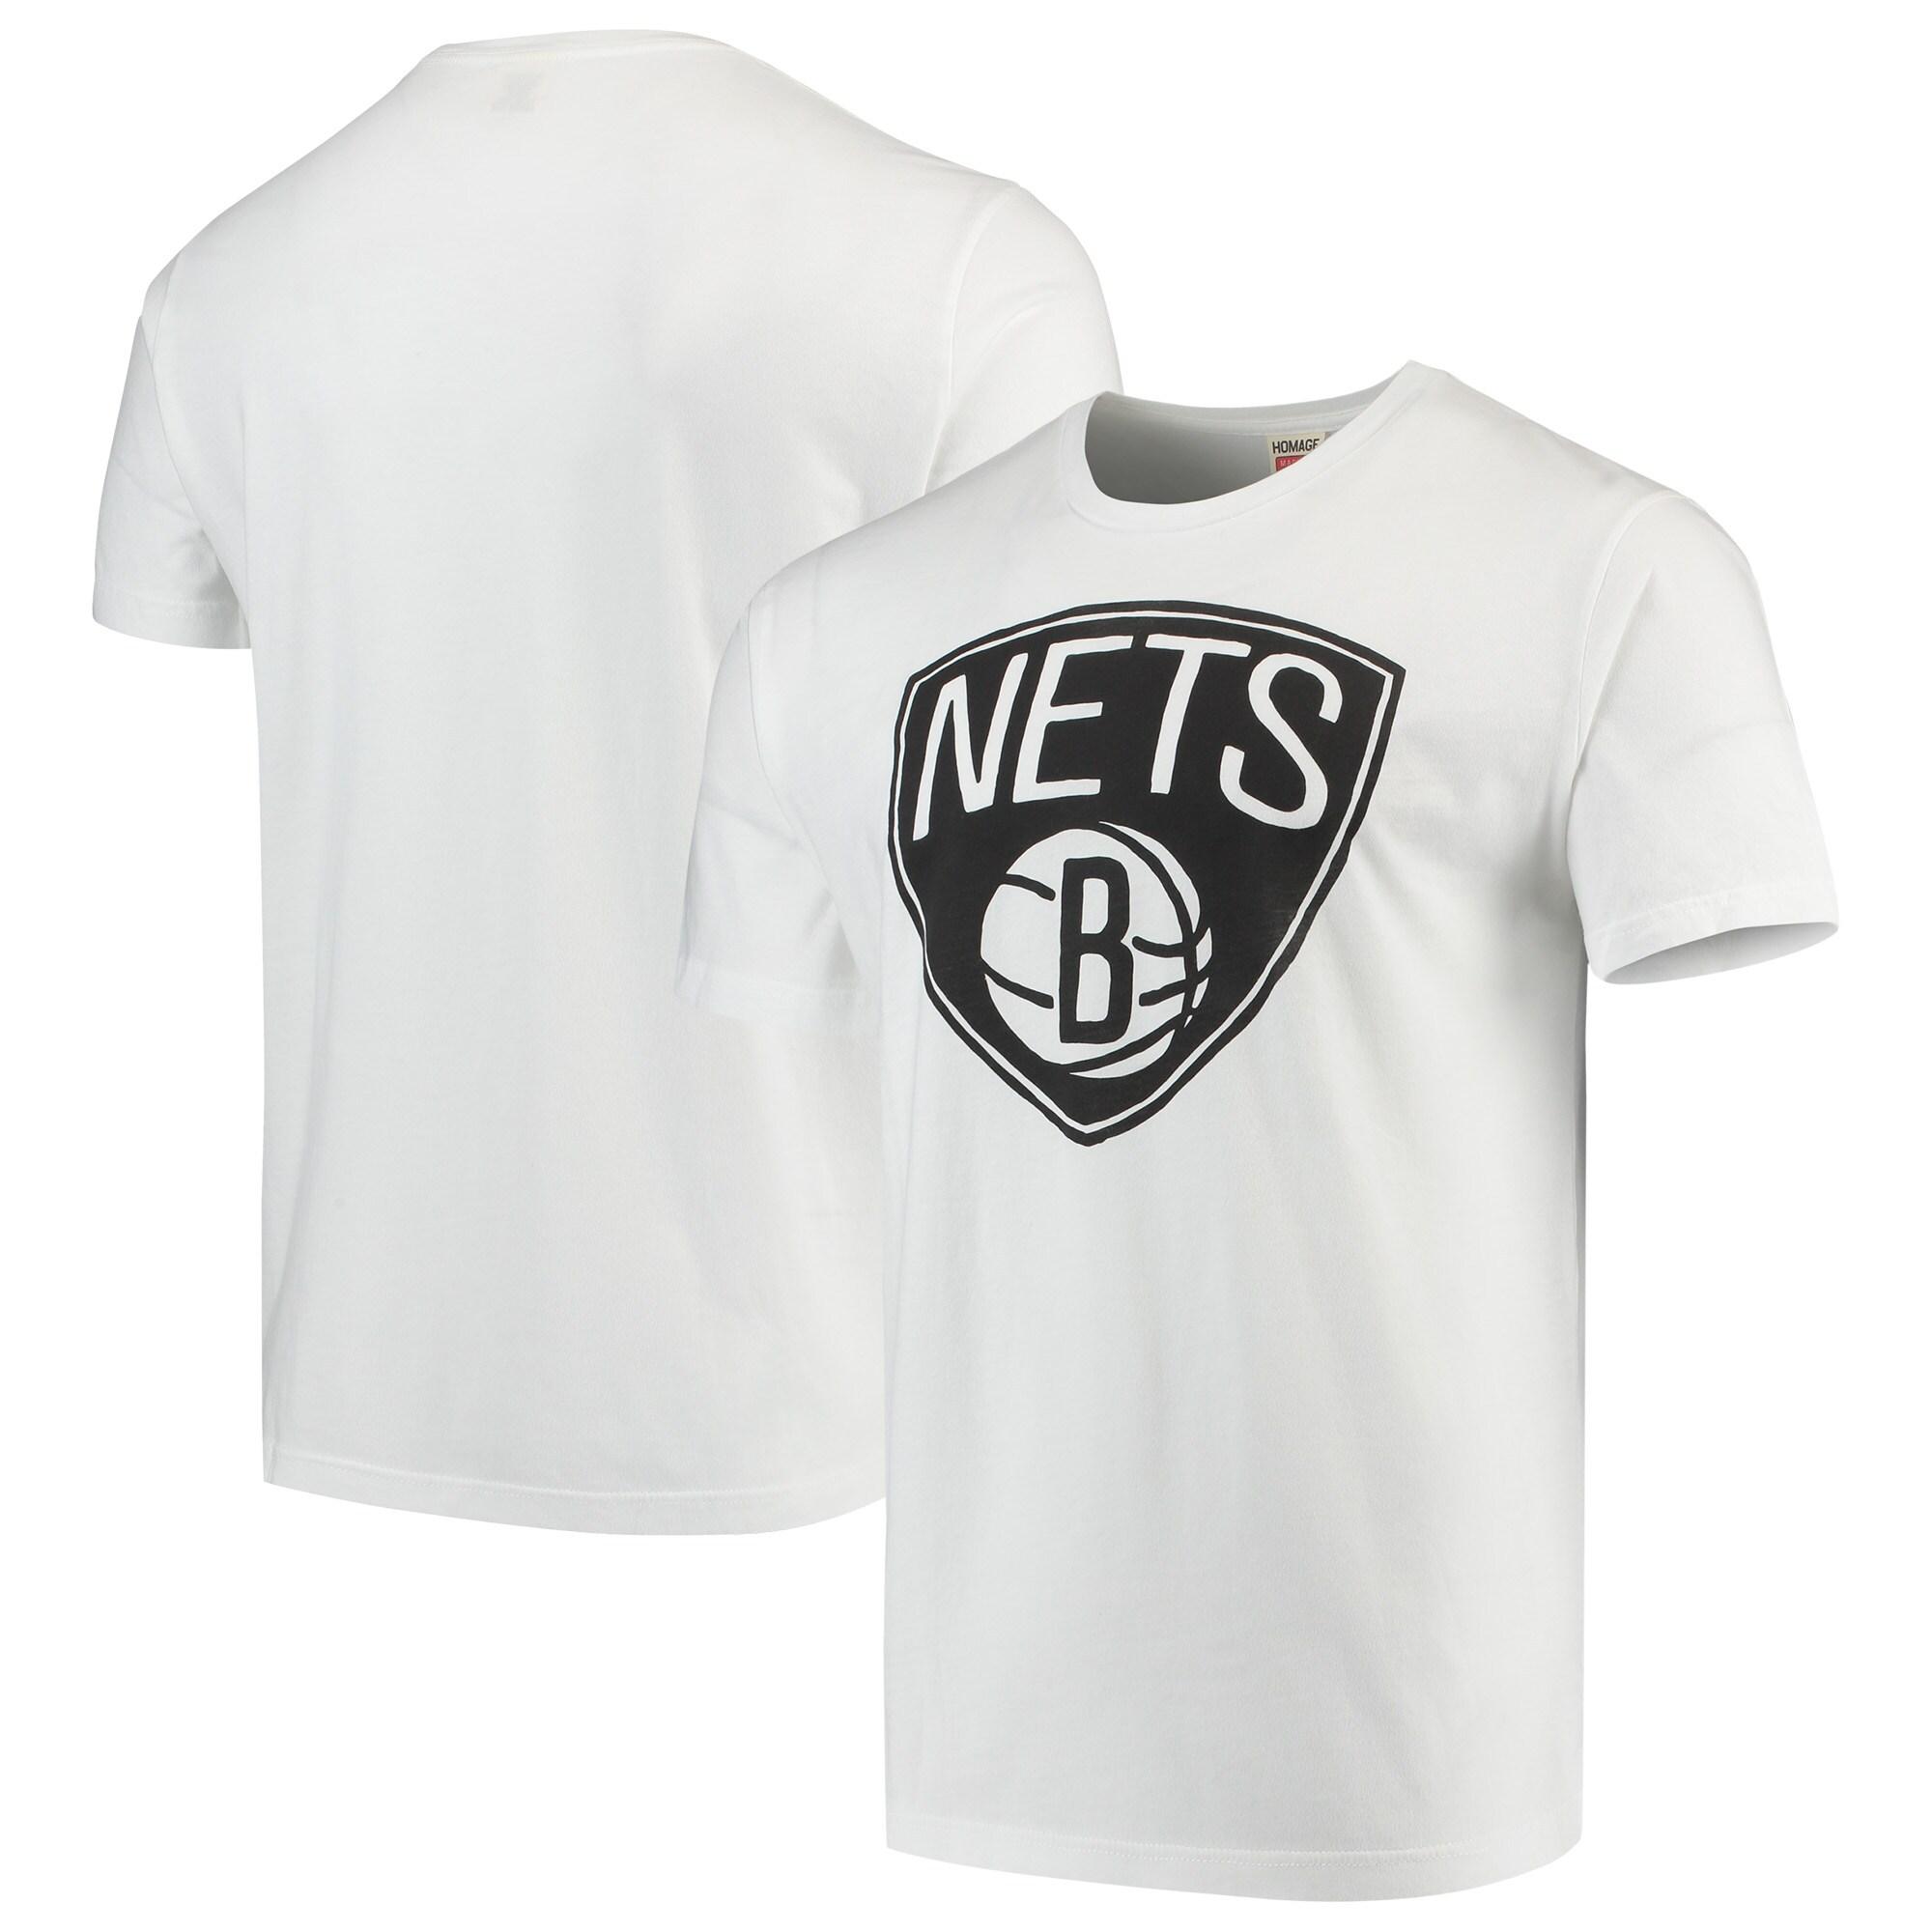 Brooklyn Nets Team T-Shirt - White